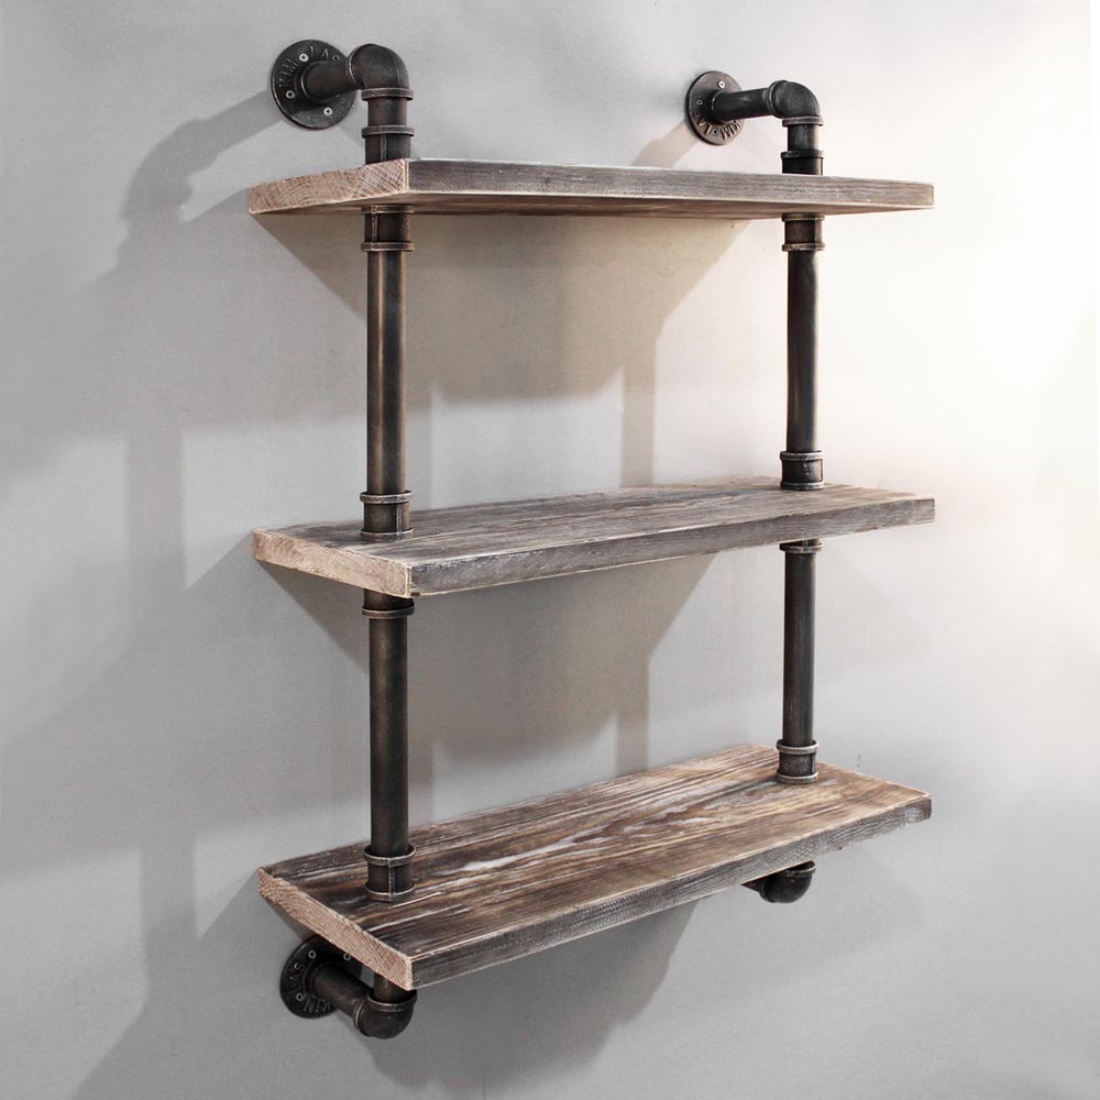 3 Level Rustic Bookshelf Industrial Pipe and Wood Shelf Vintage Look Wall Mount